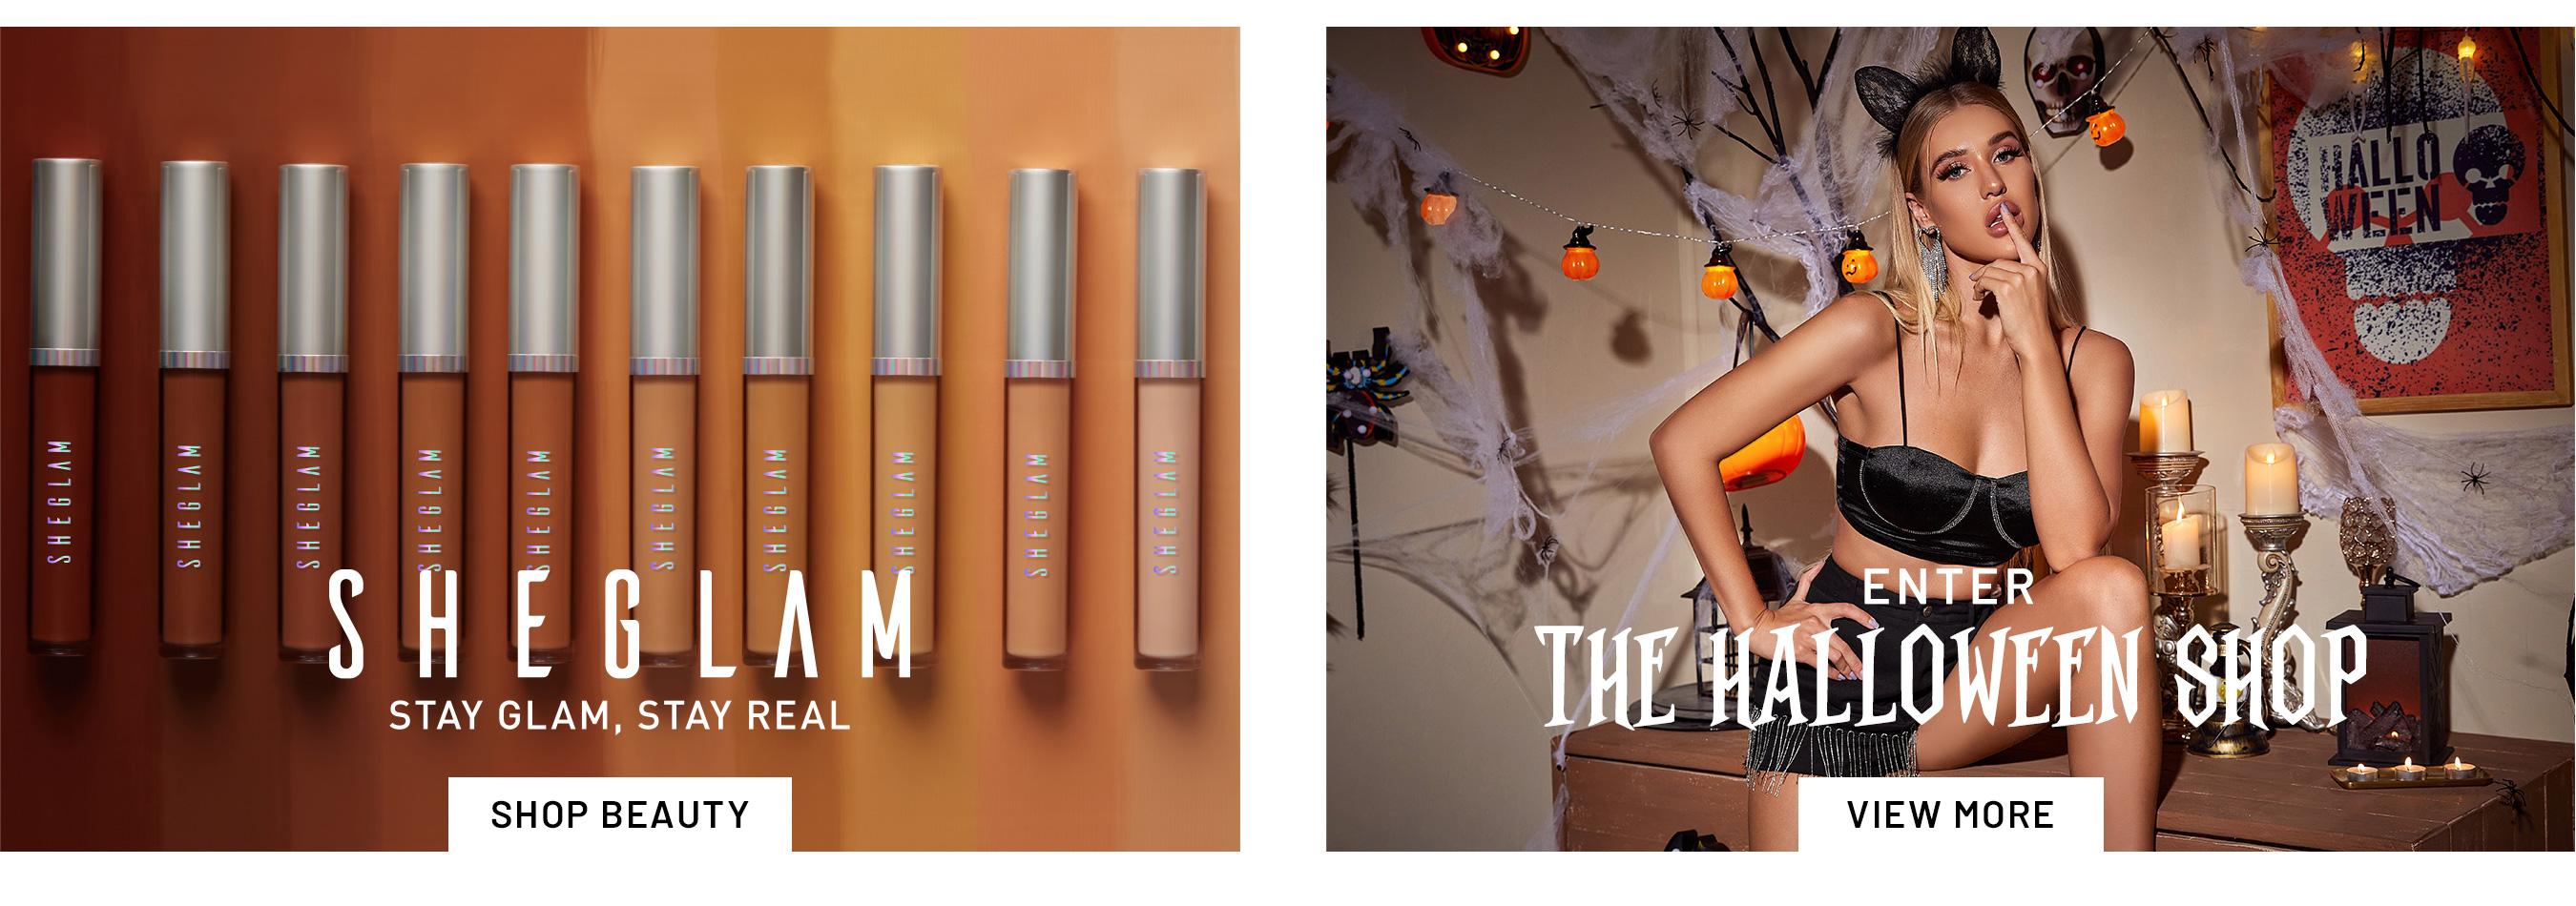 Shein Coupons - Makeup starting at just $4